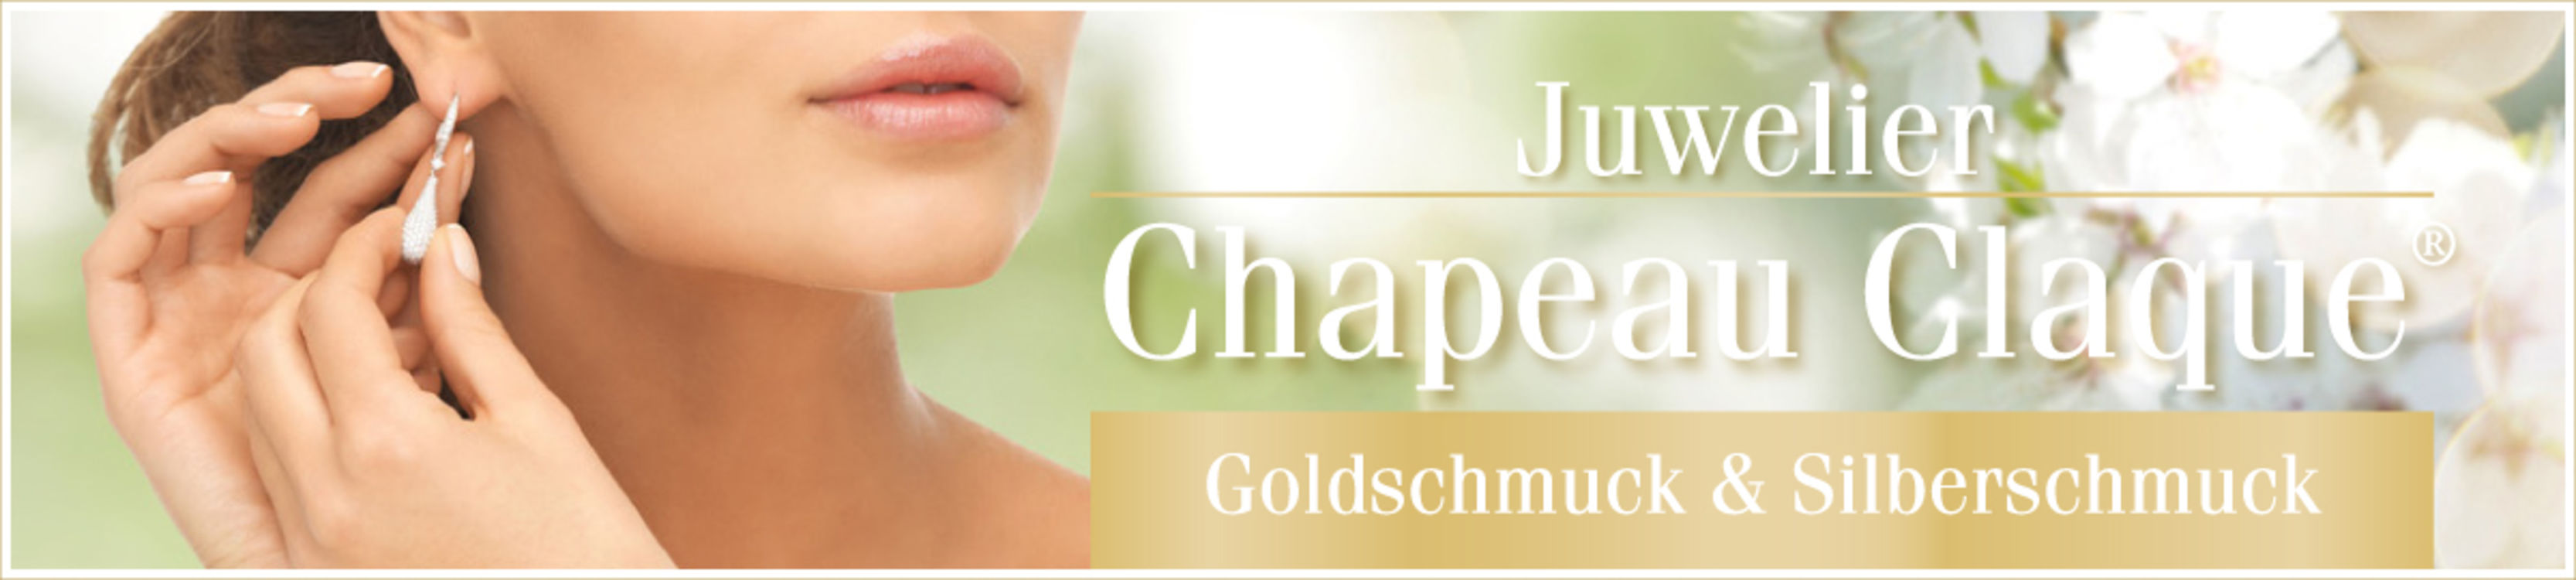 Juwelier Chapeau Claque in Lüdenscheid (Bild 5)